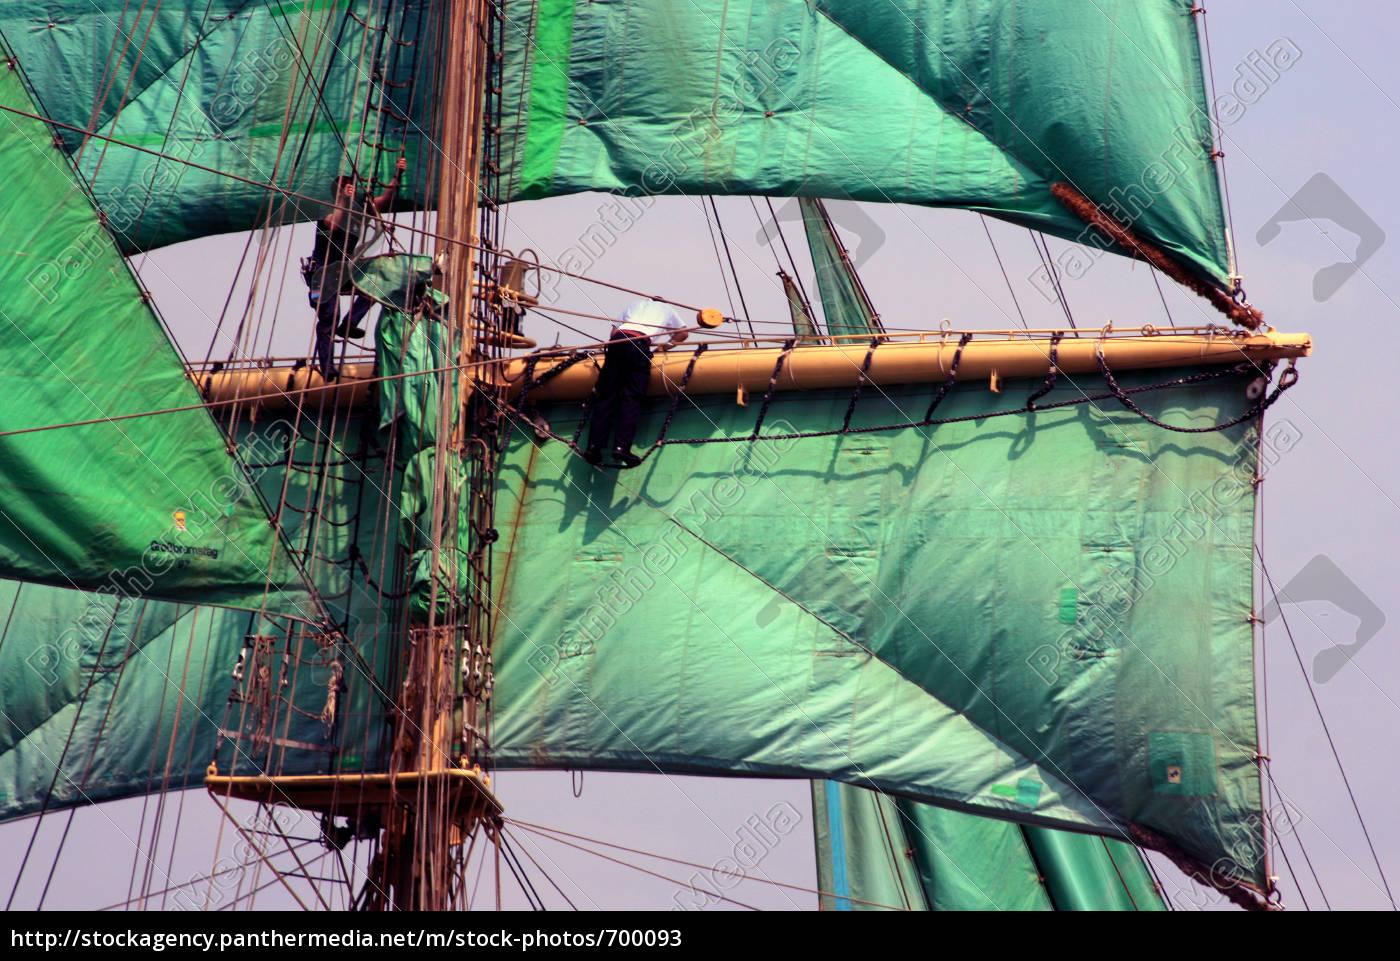 am, sailing - 700093